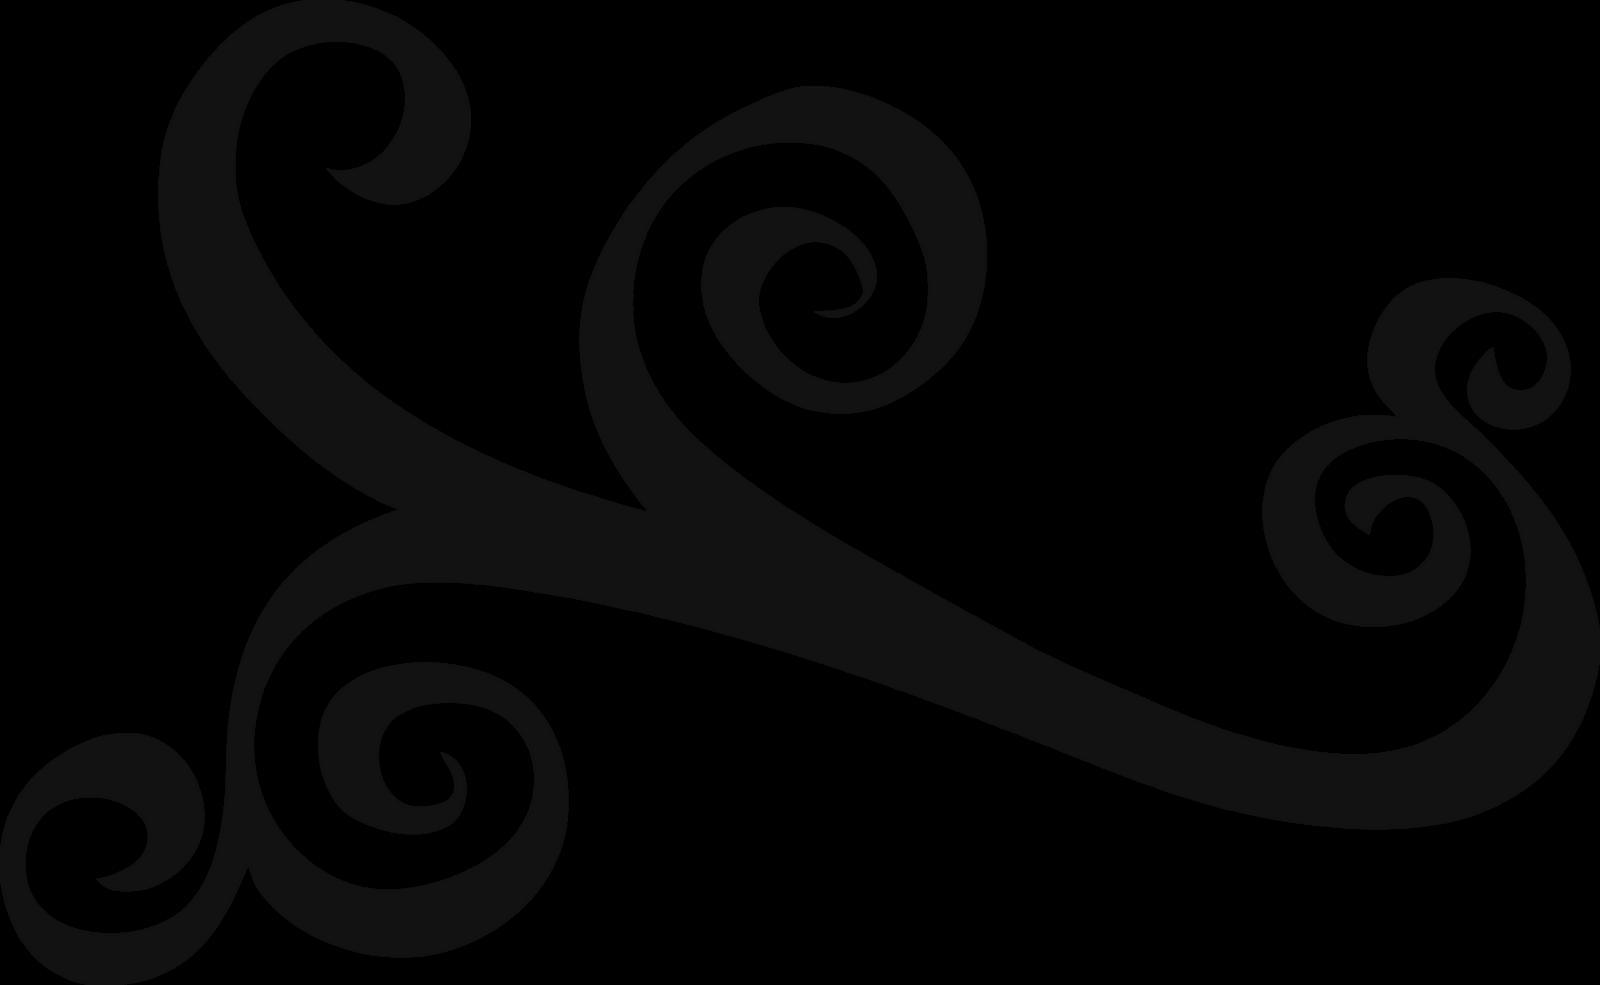 Simple Elegant Line Art : Swirly clip art cliparts